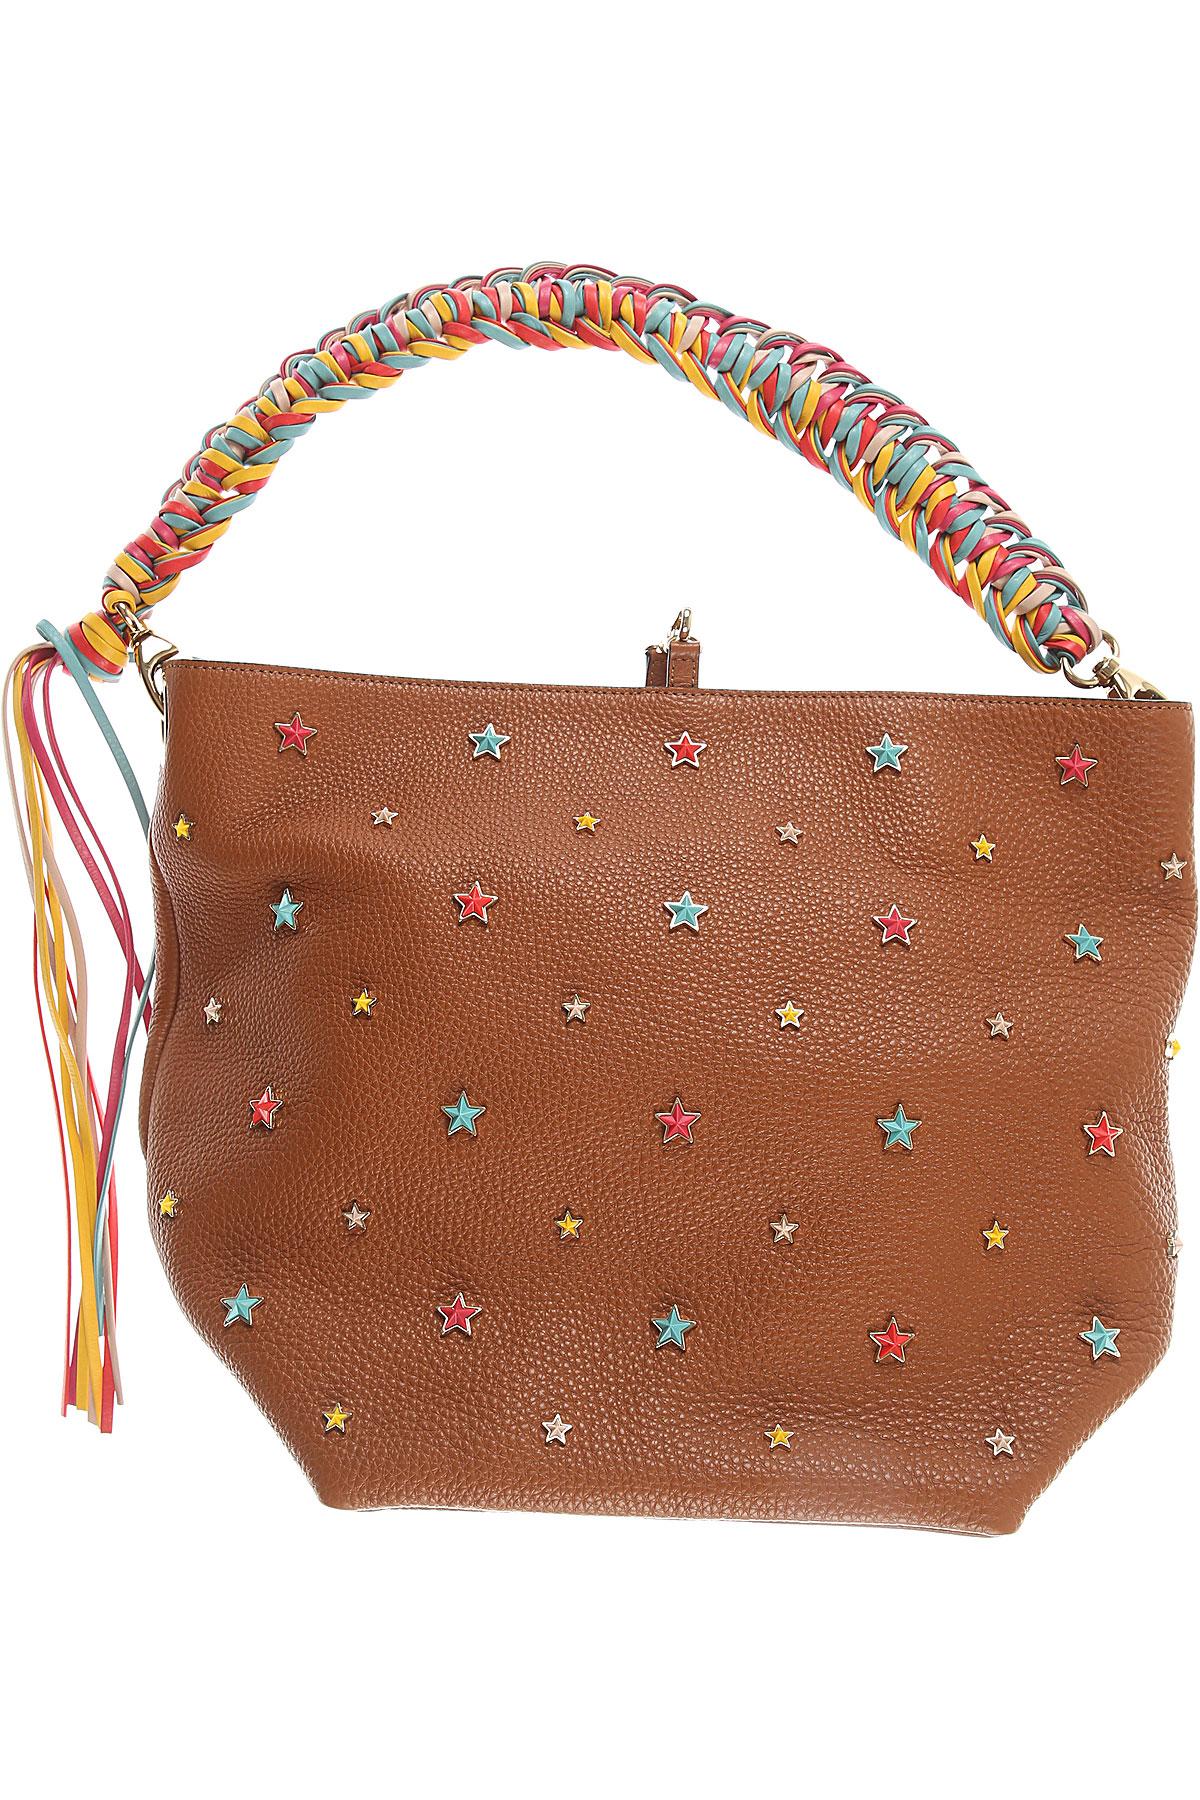 Valentino Top Handle Handbag On Sale, cuir, Leather, 2017 USA-466613